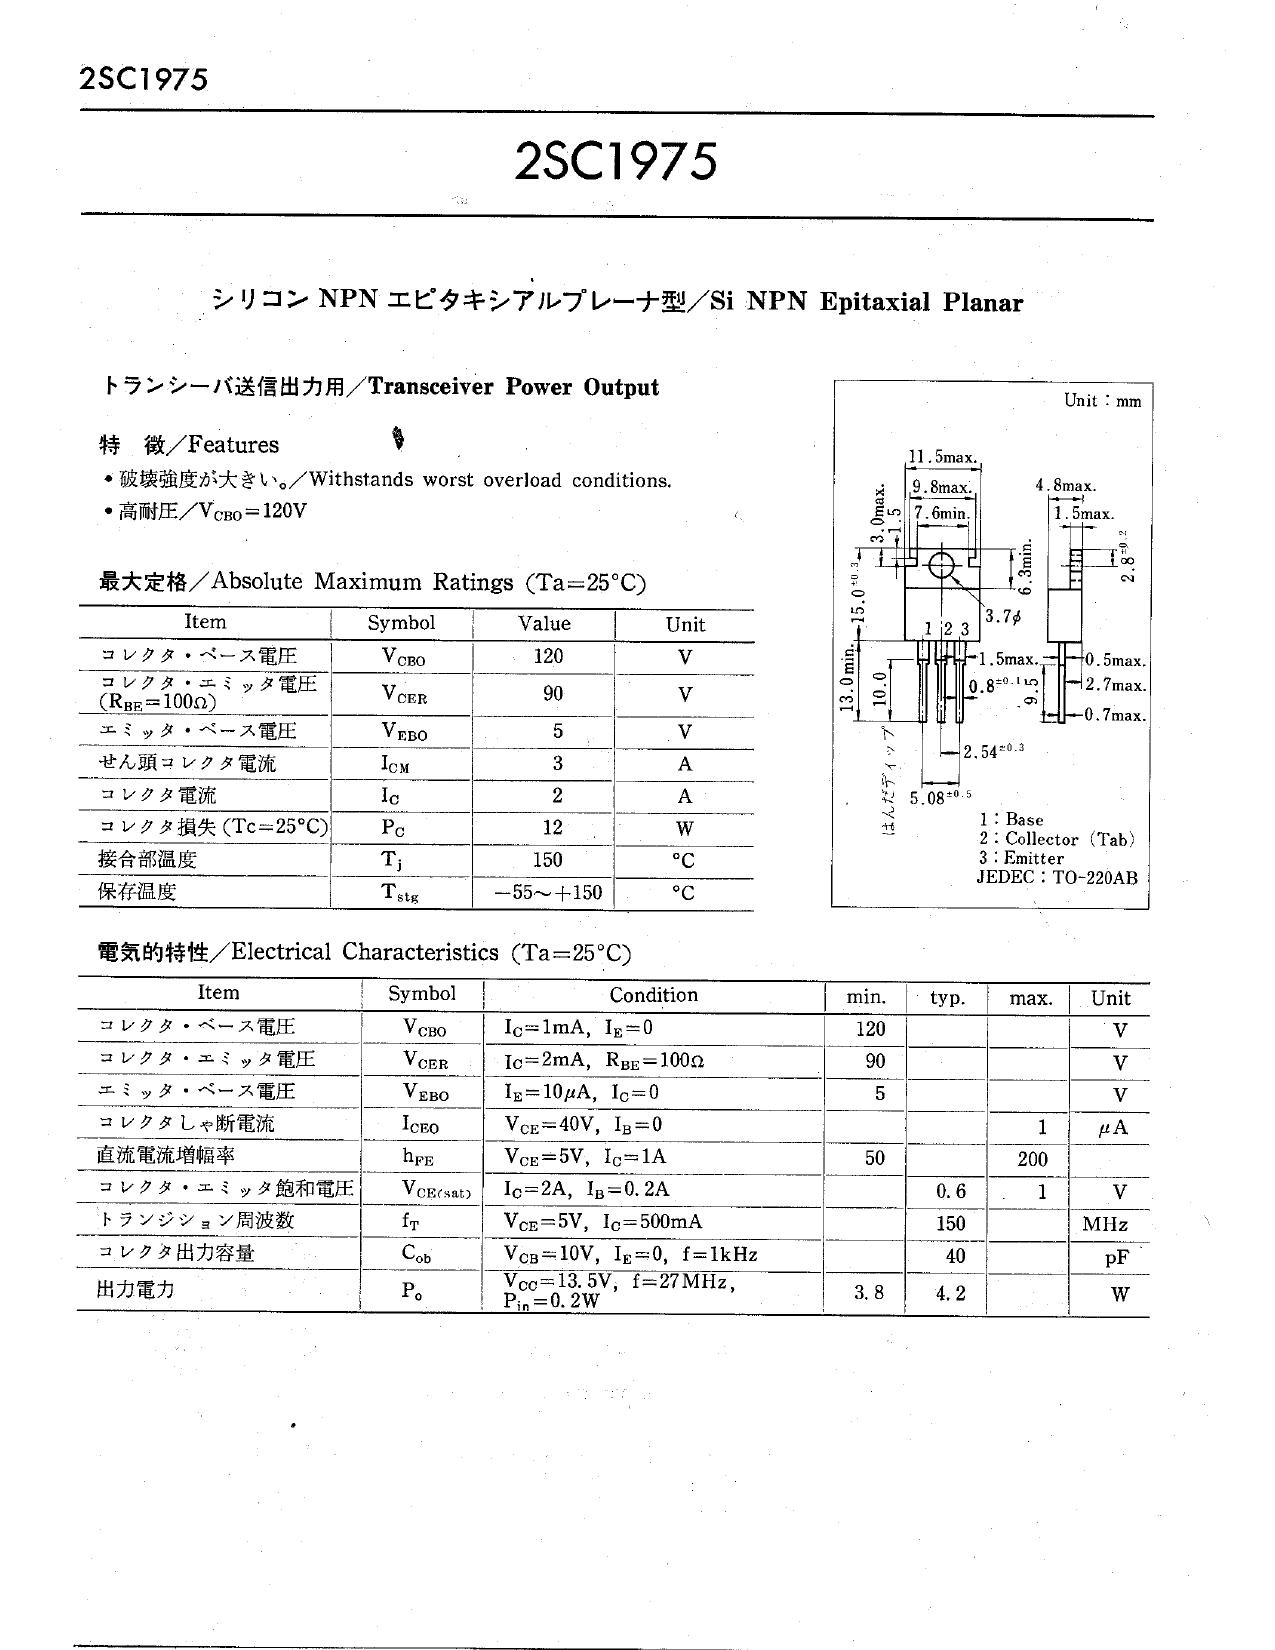 2SC1975 Datasheet